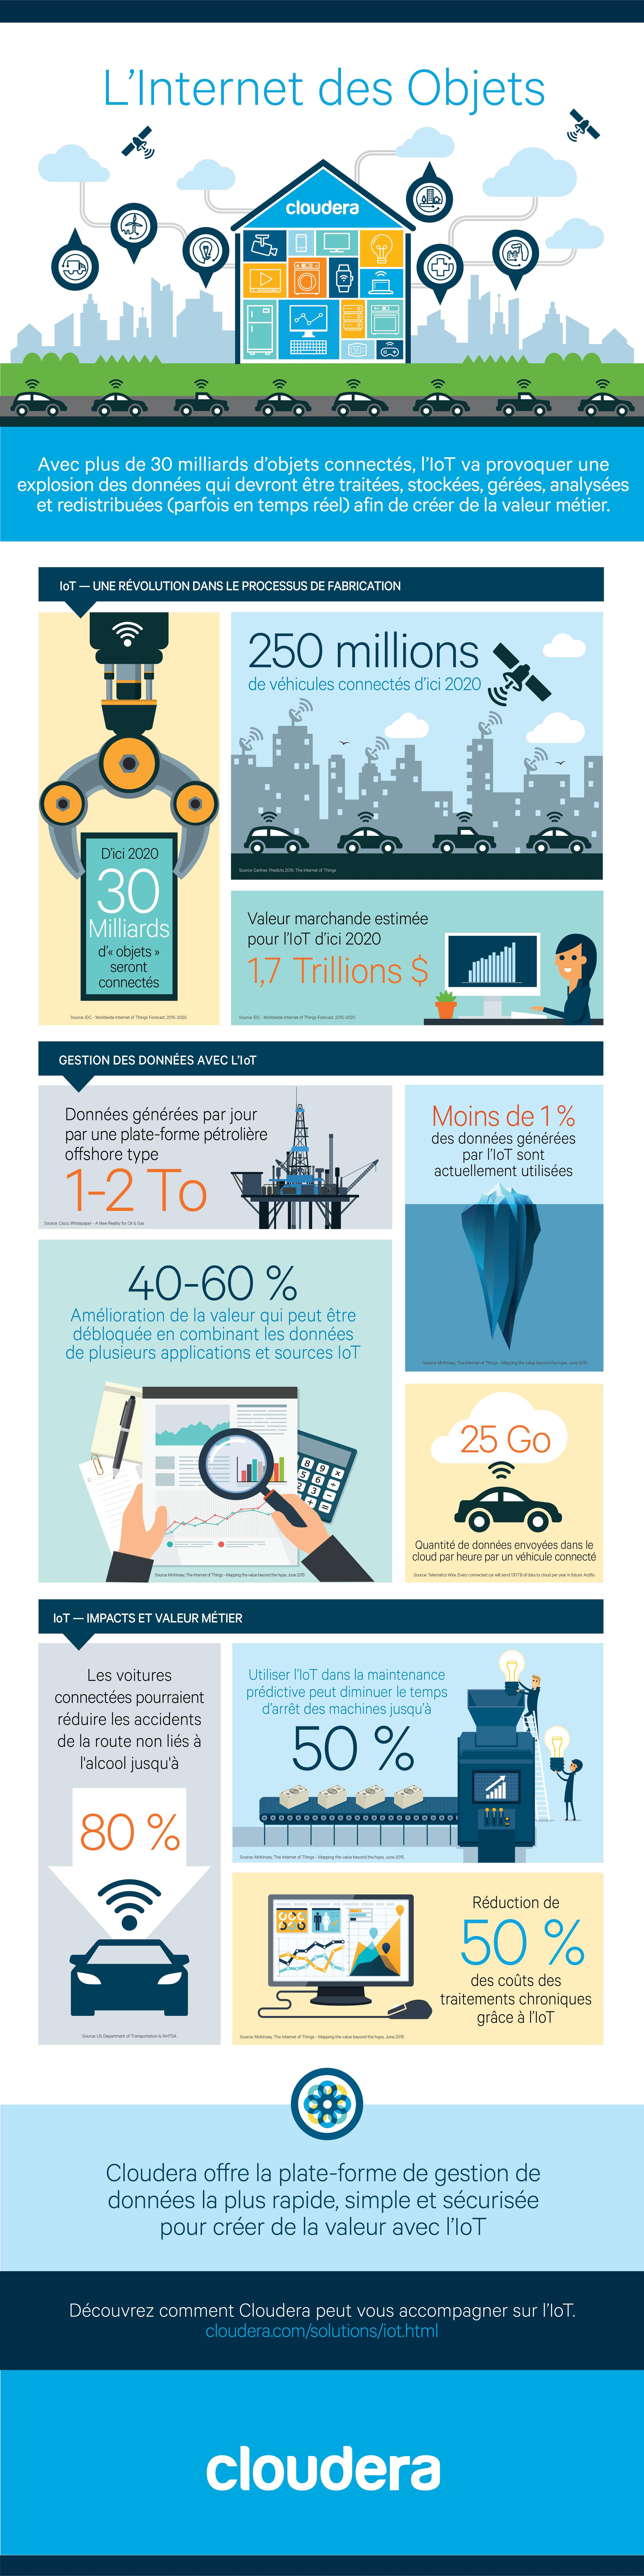 infographie_cloudera